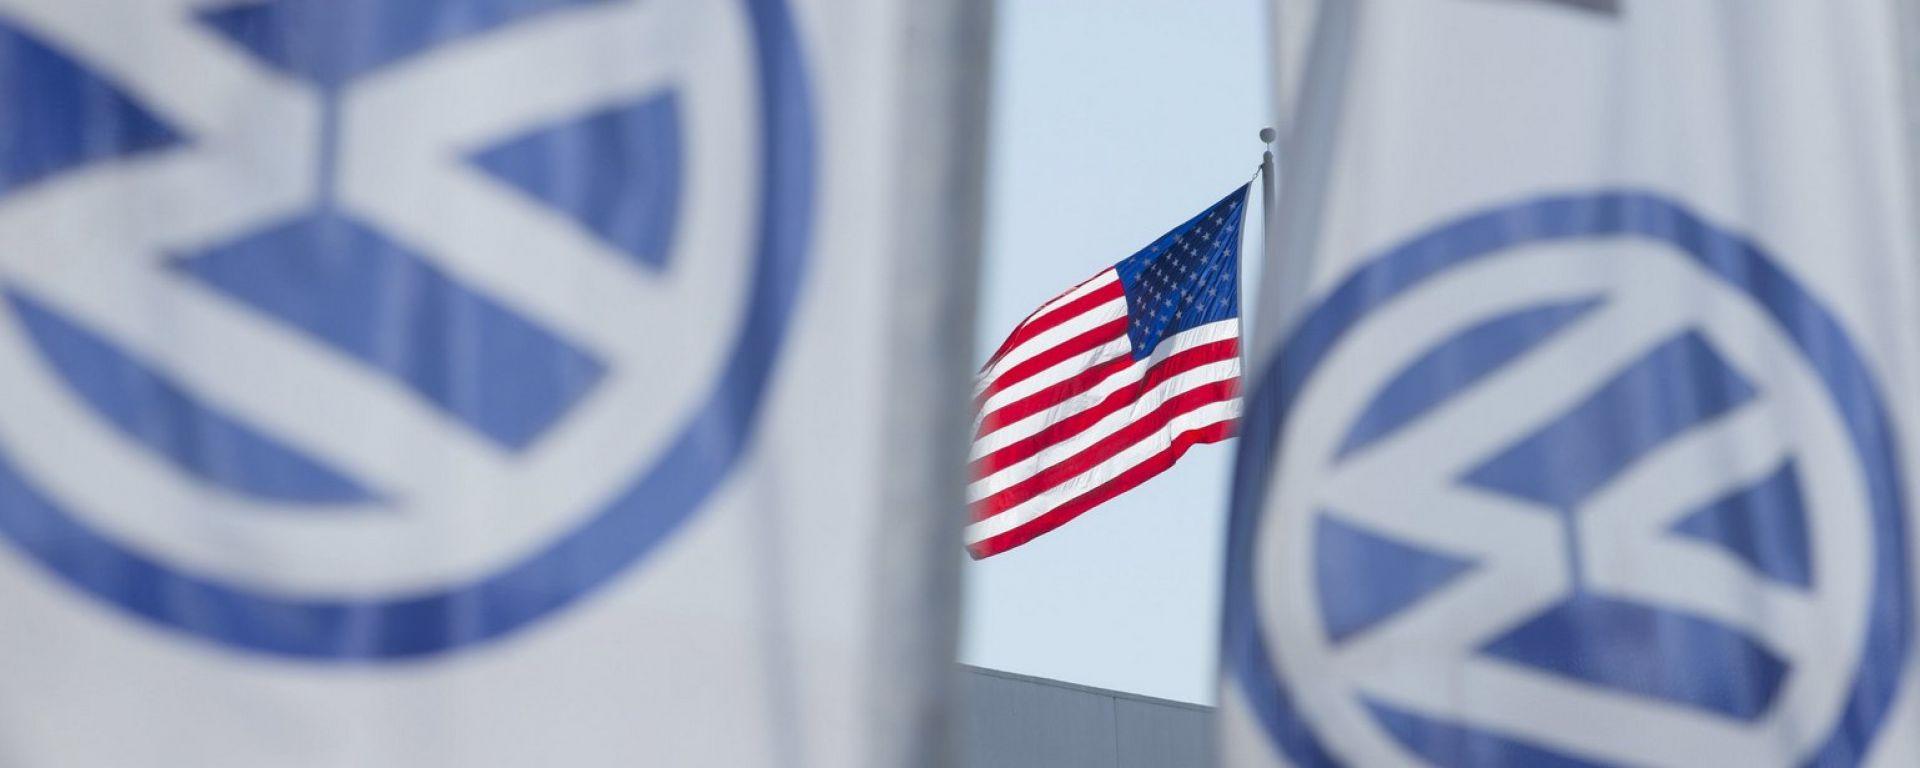 Dieselgate, Volkswagen paga ancora: 1,2 miliardi di dollari ai dealer USA